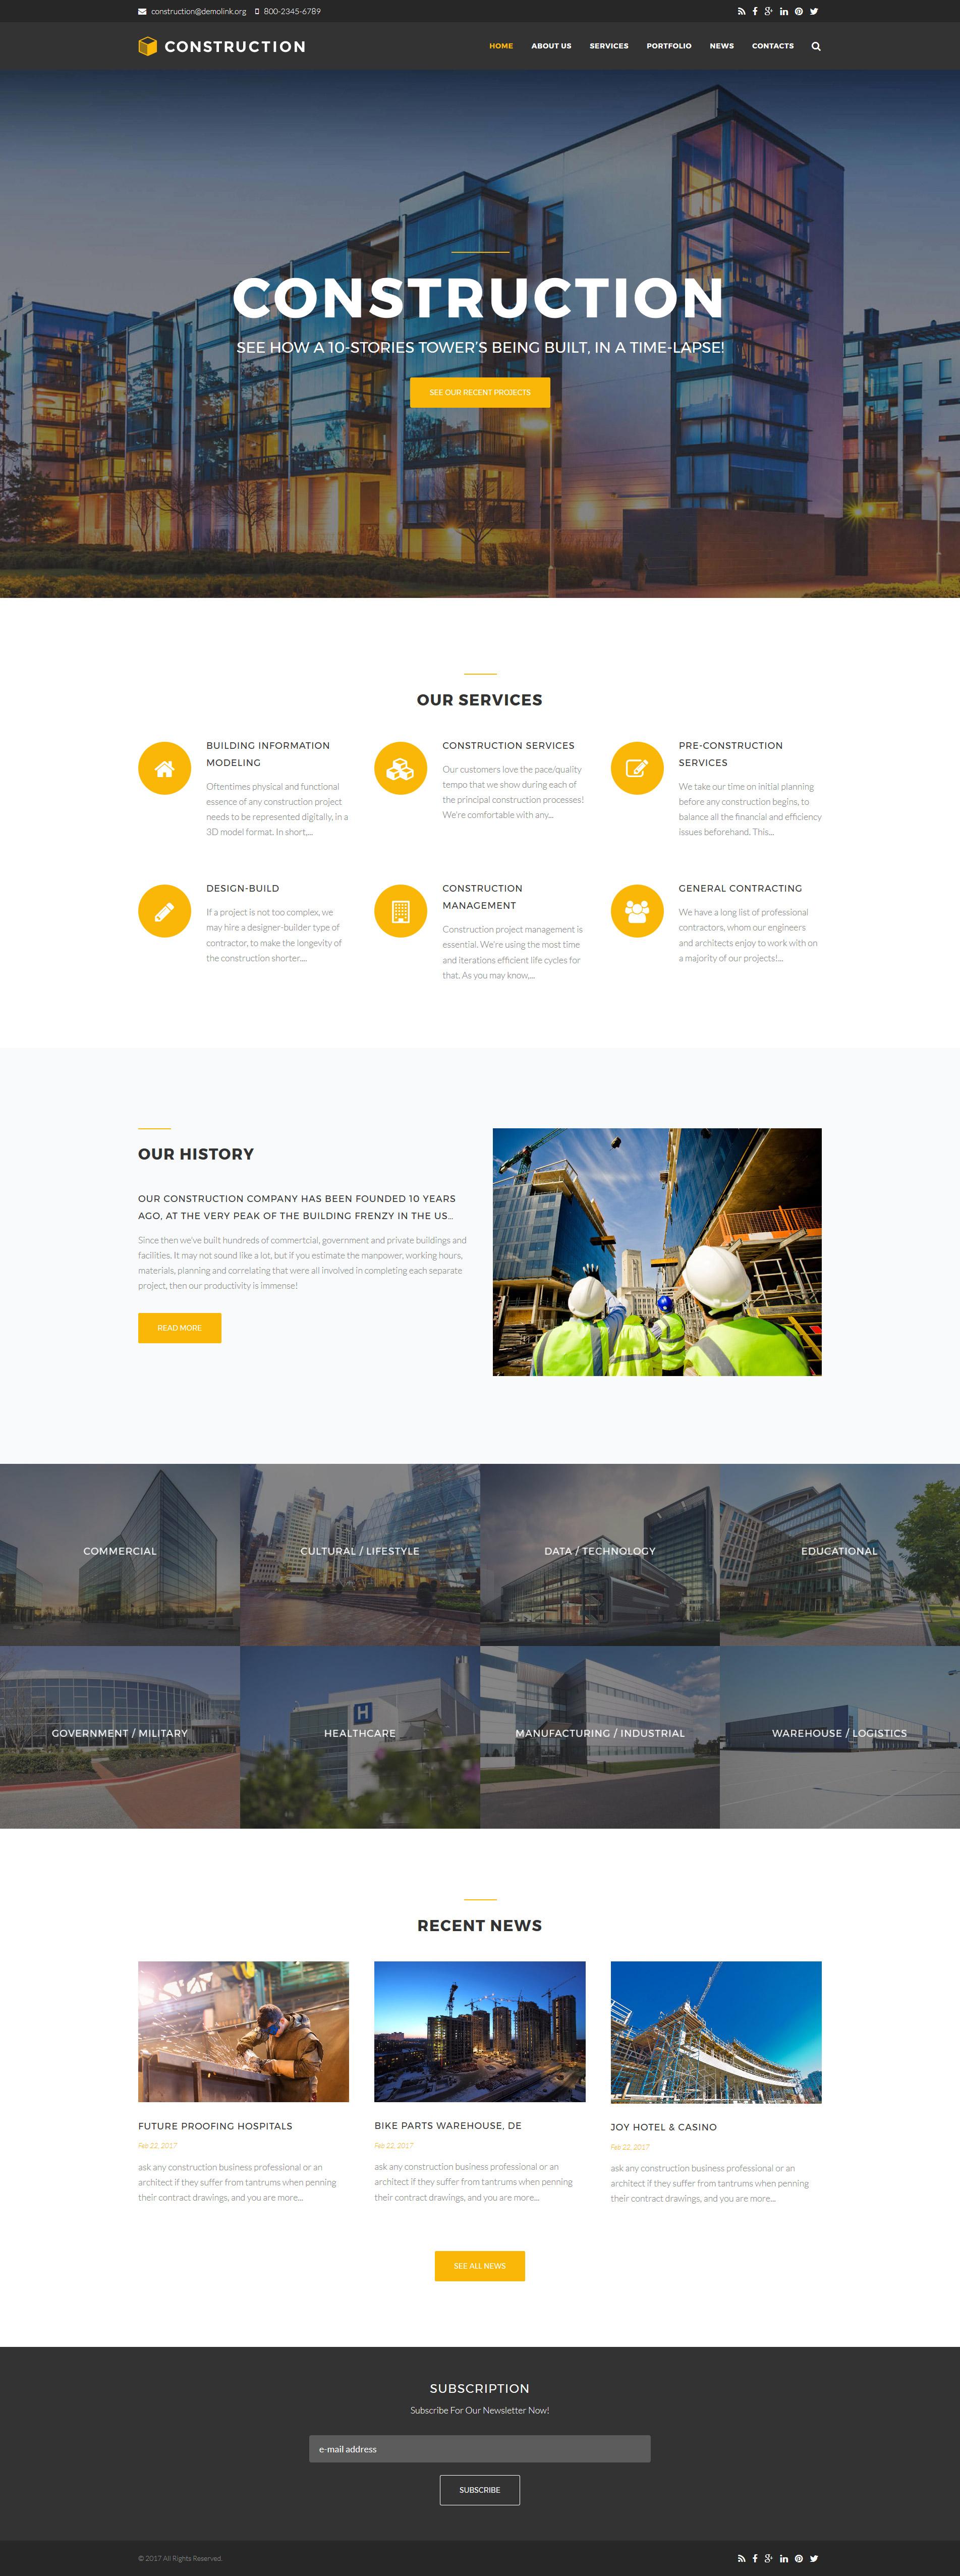 Website Design Template 62481 - professional